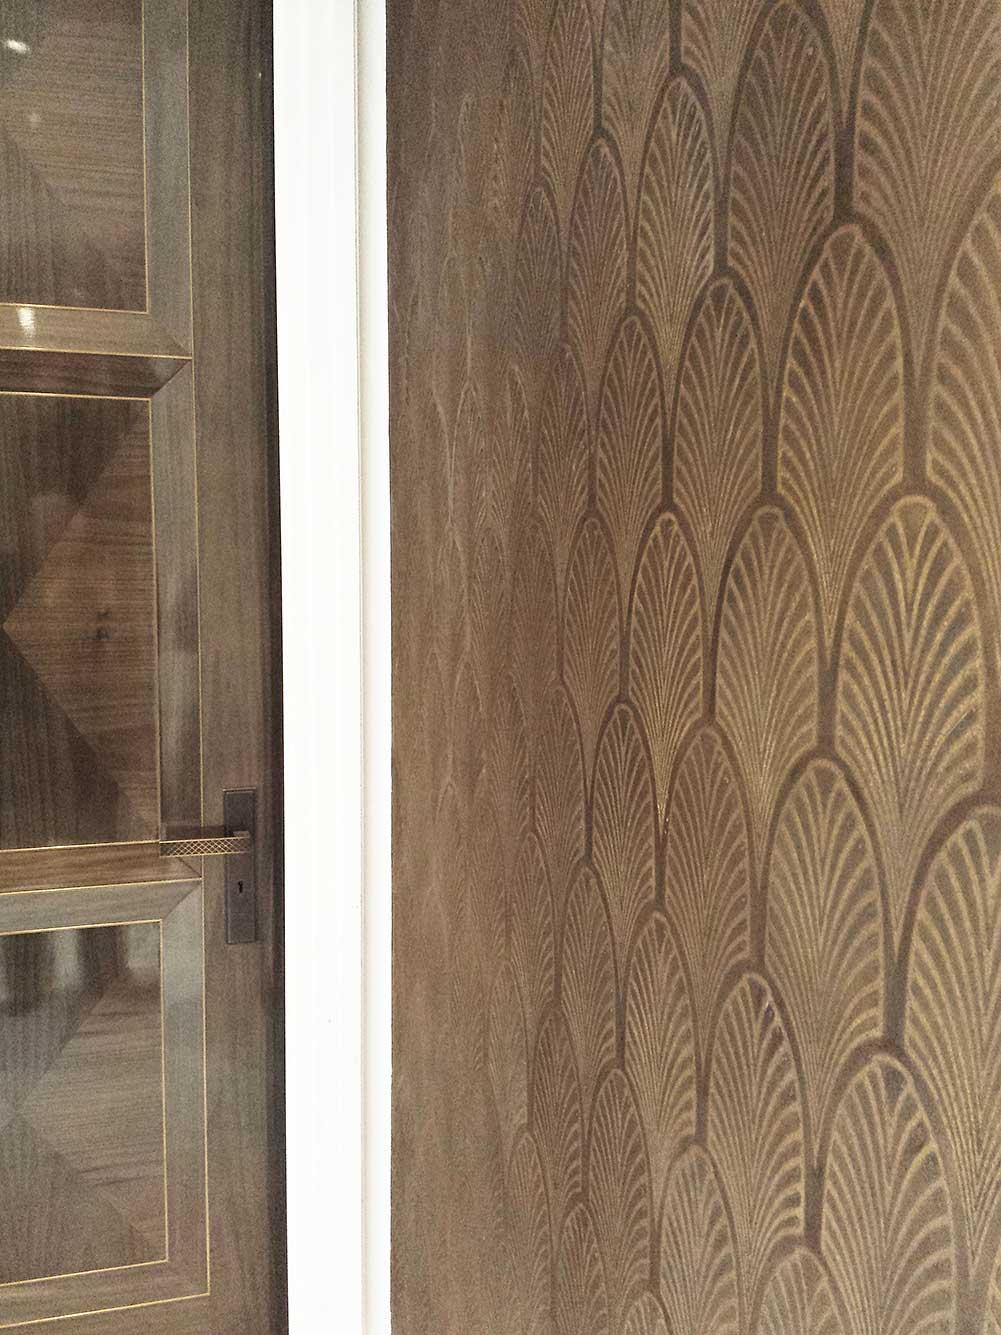 Polished Plaster Art Deco Stucco Design   Hand Applied In Situ Finish    INTERIOR WALLS U2013